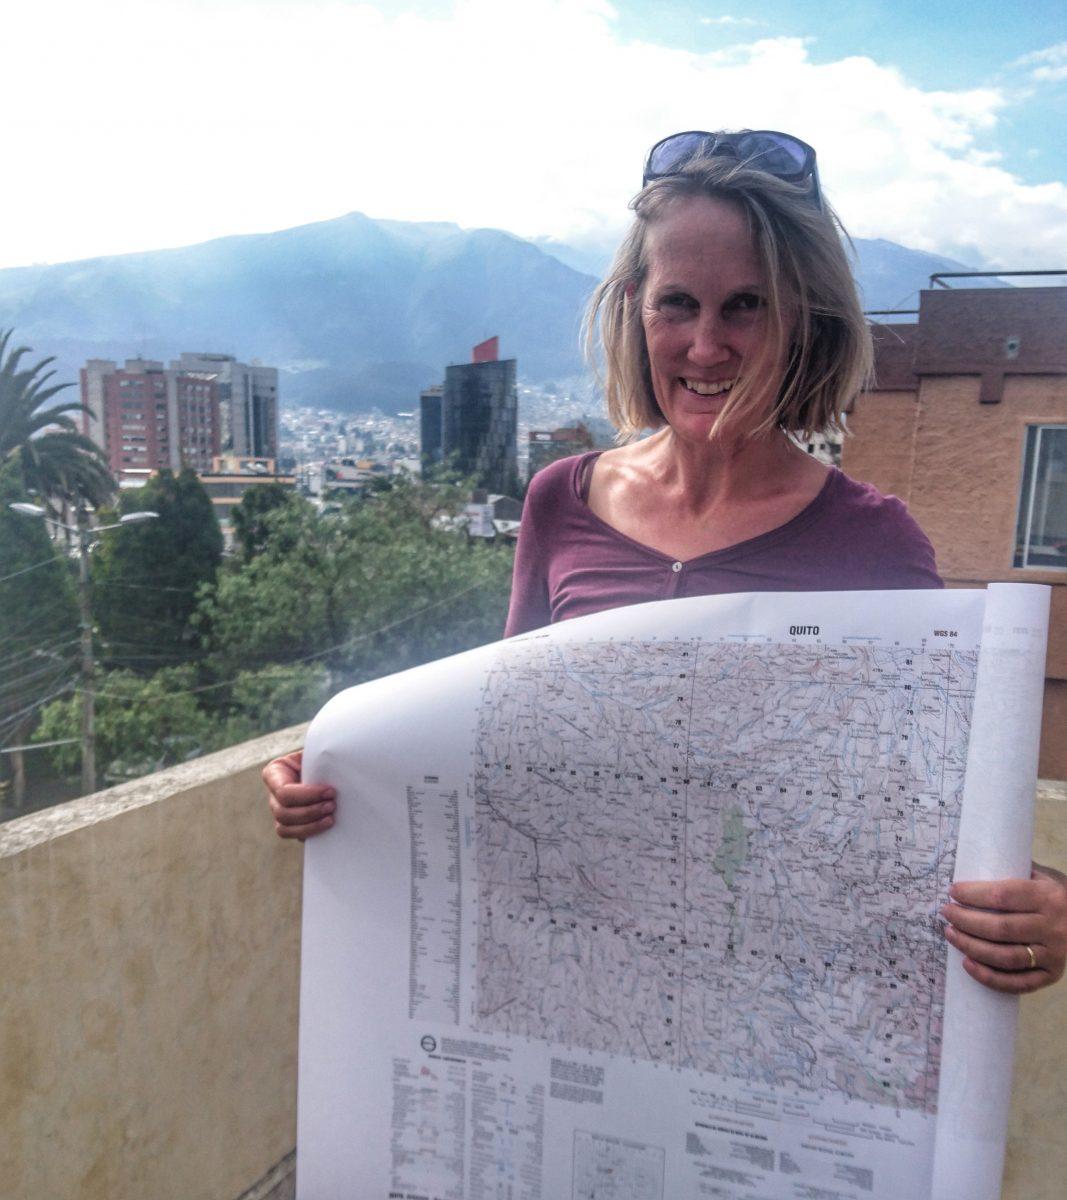 Wanderkarten kaufen in Quito